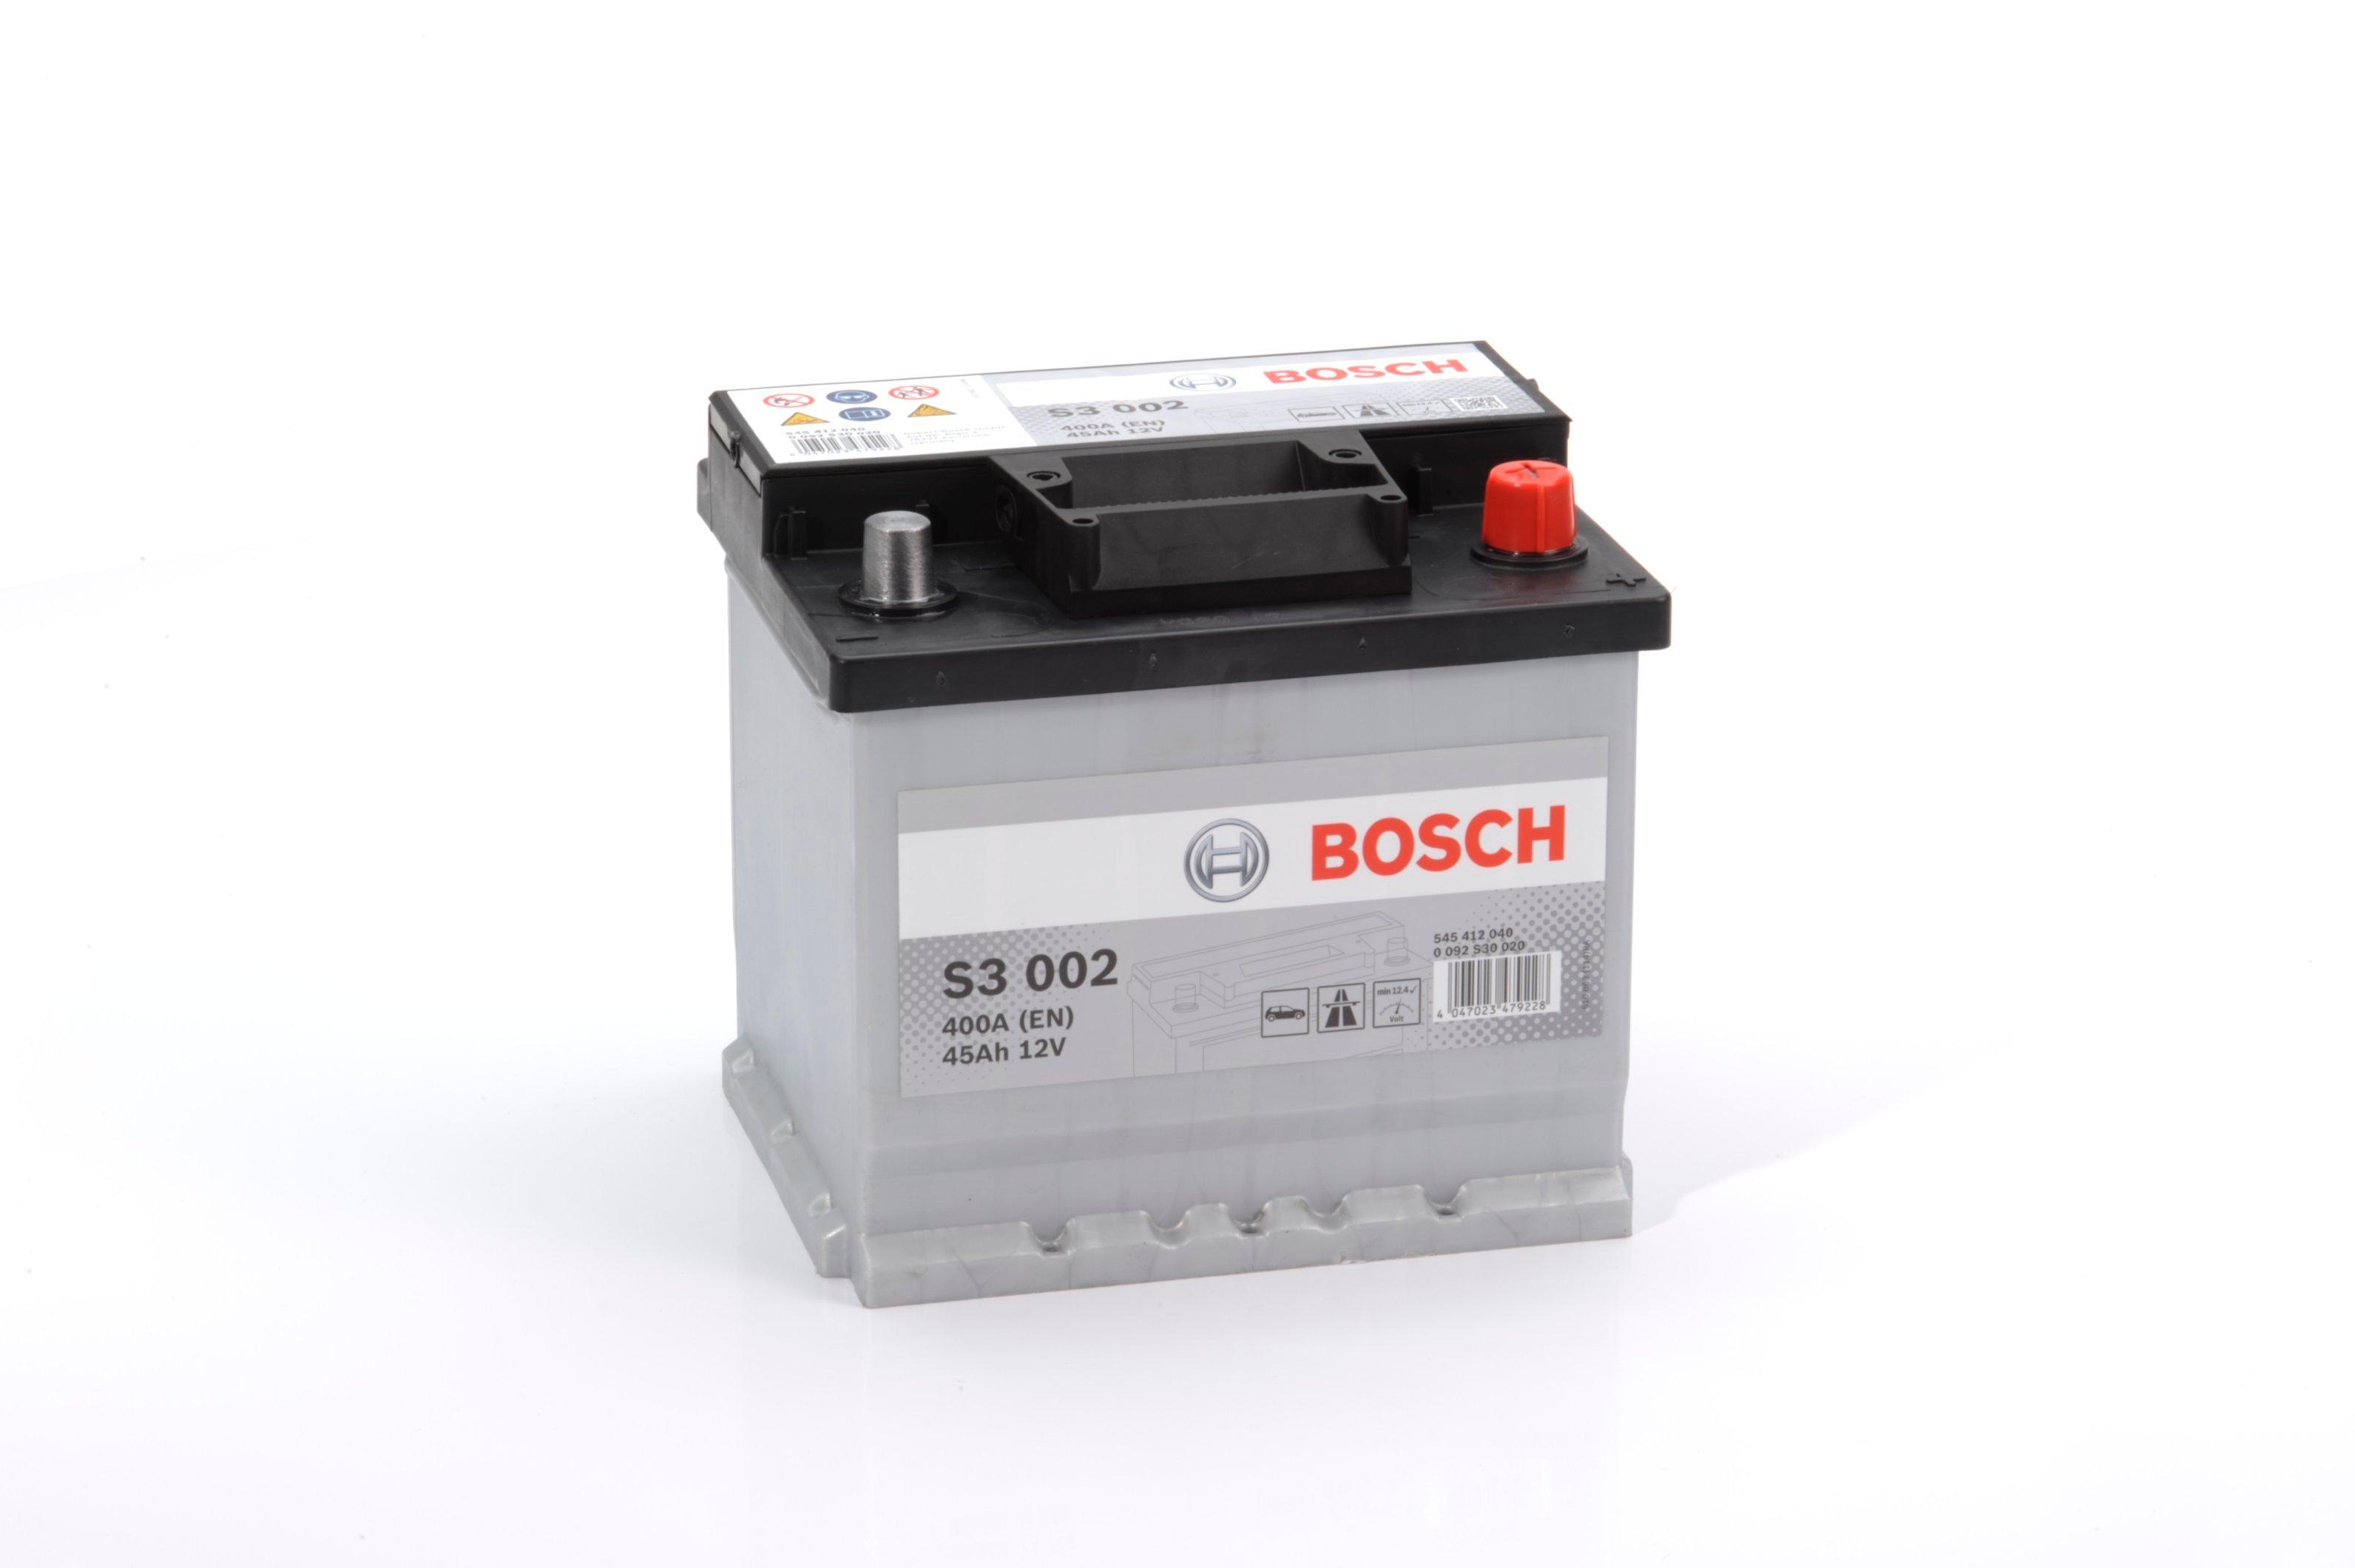 Батарея аккумуляторная Bosch S3 002 12В 45Ач 400A(EN) R+ Bosch 0 092 S30 020 - фото 16